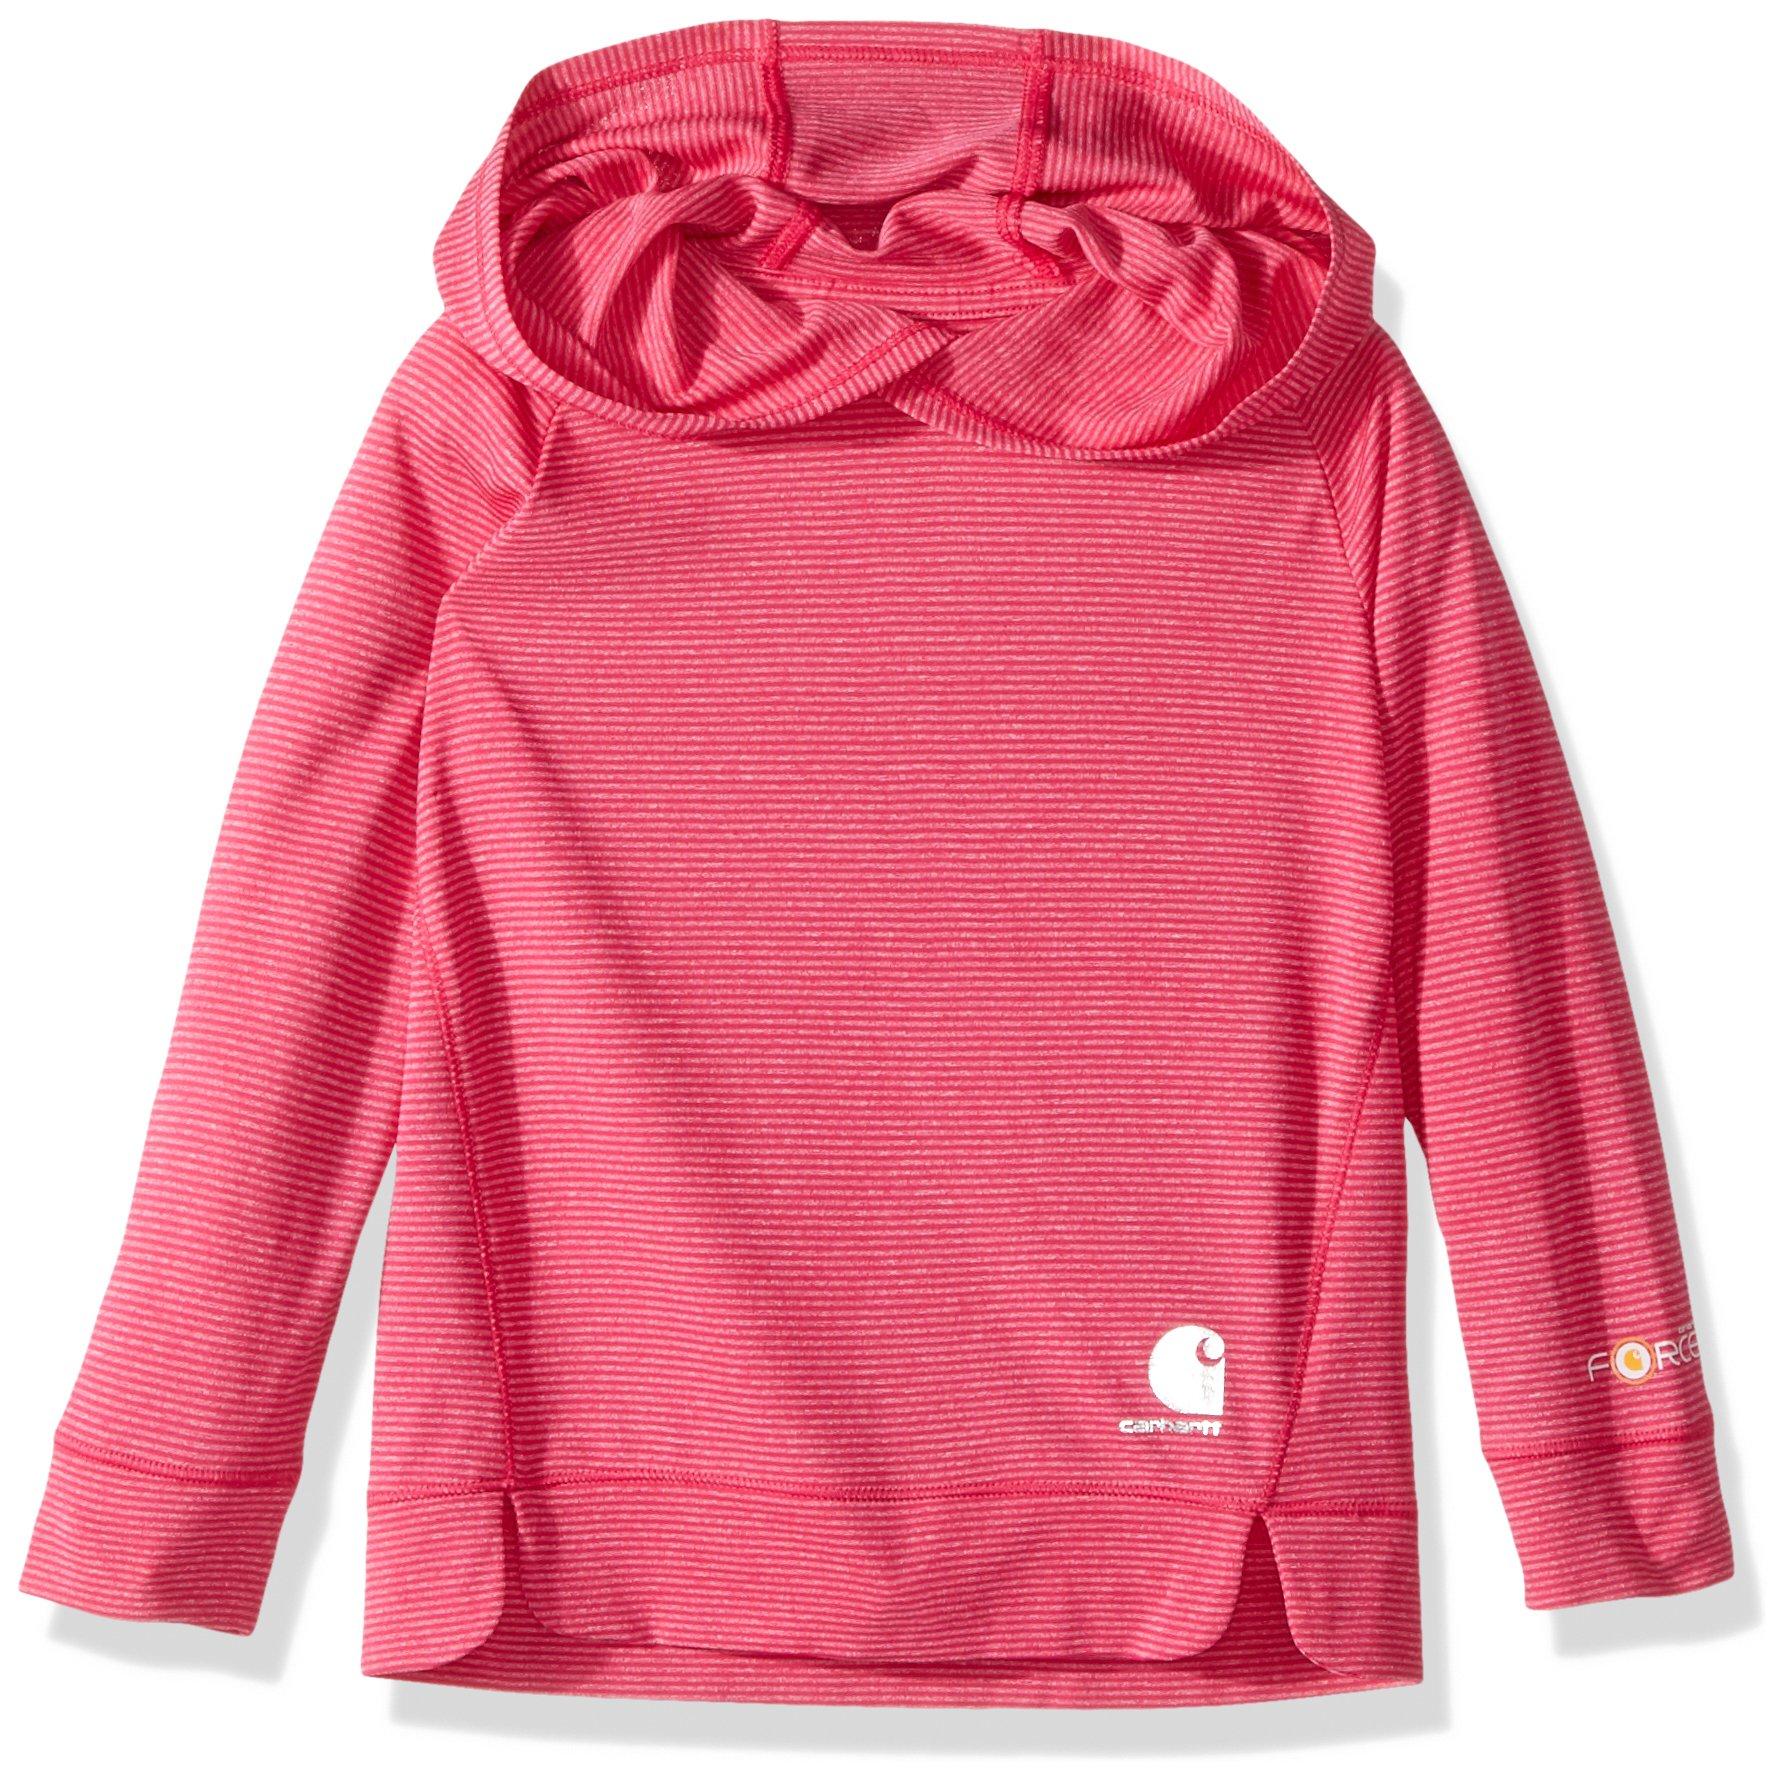 Carhartt Toddler Girls' Long Sleeve Sweatshirt, Force Bright Pink, 2T